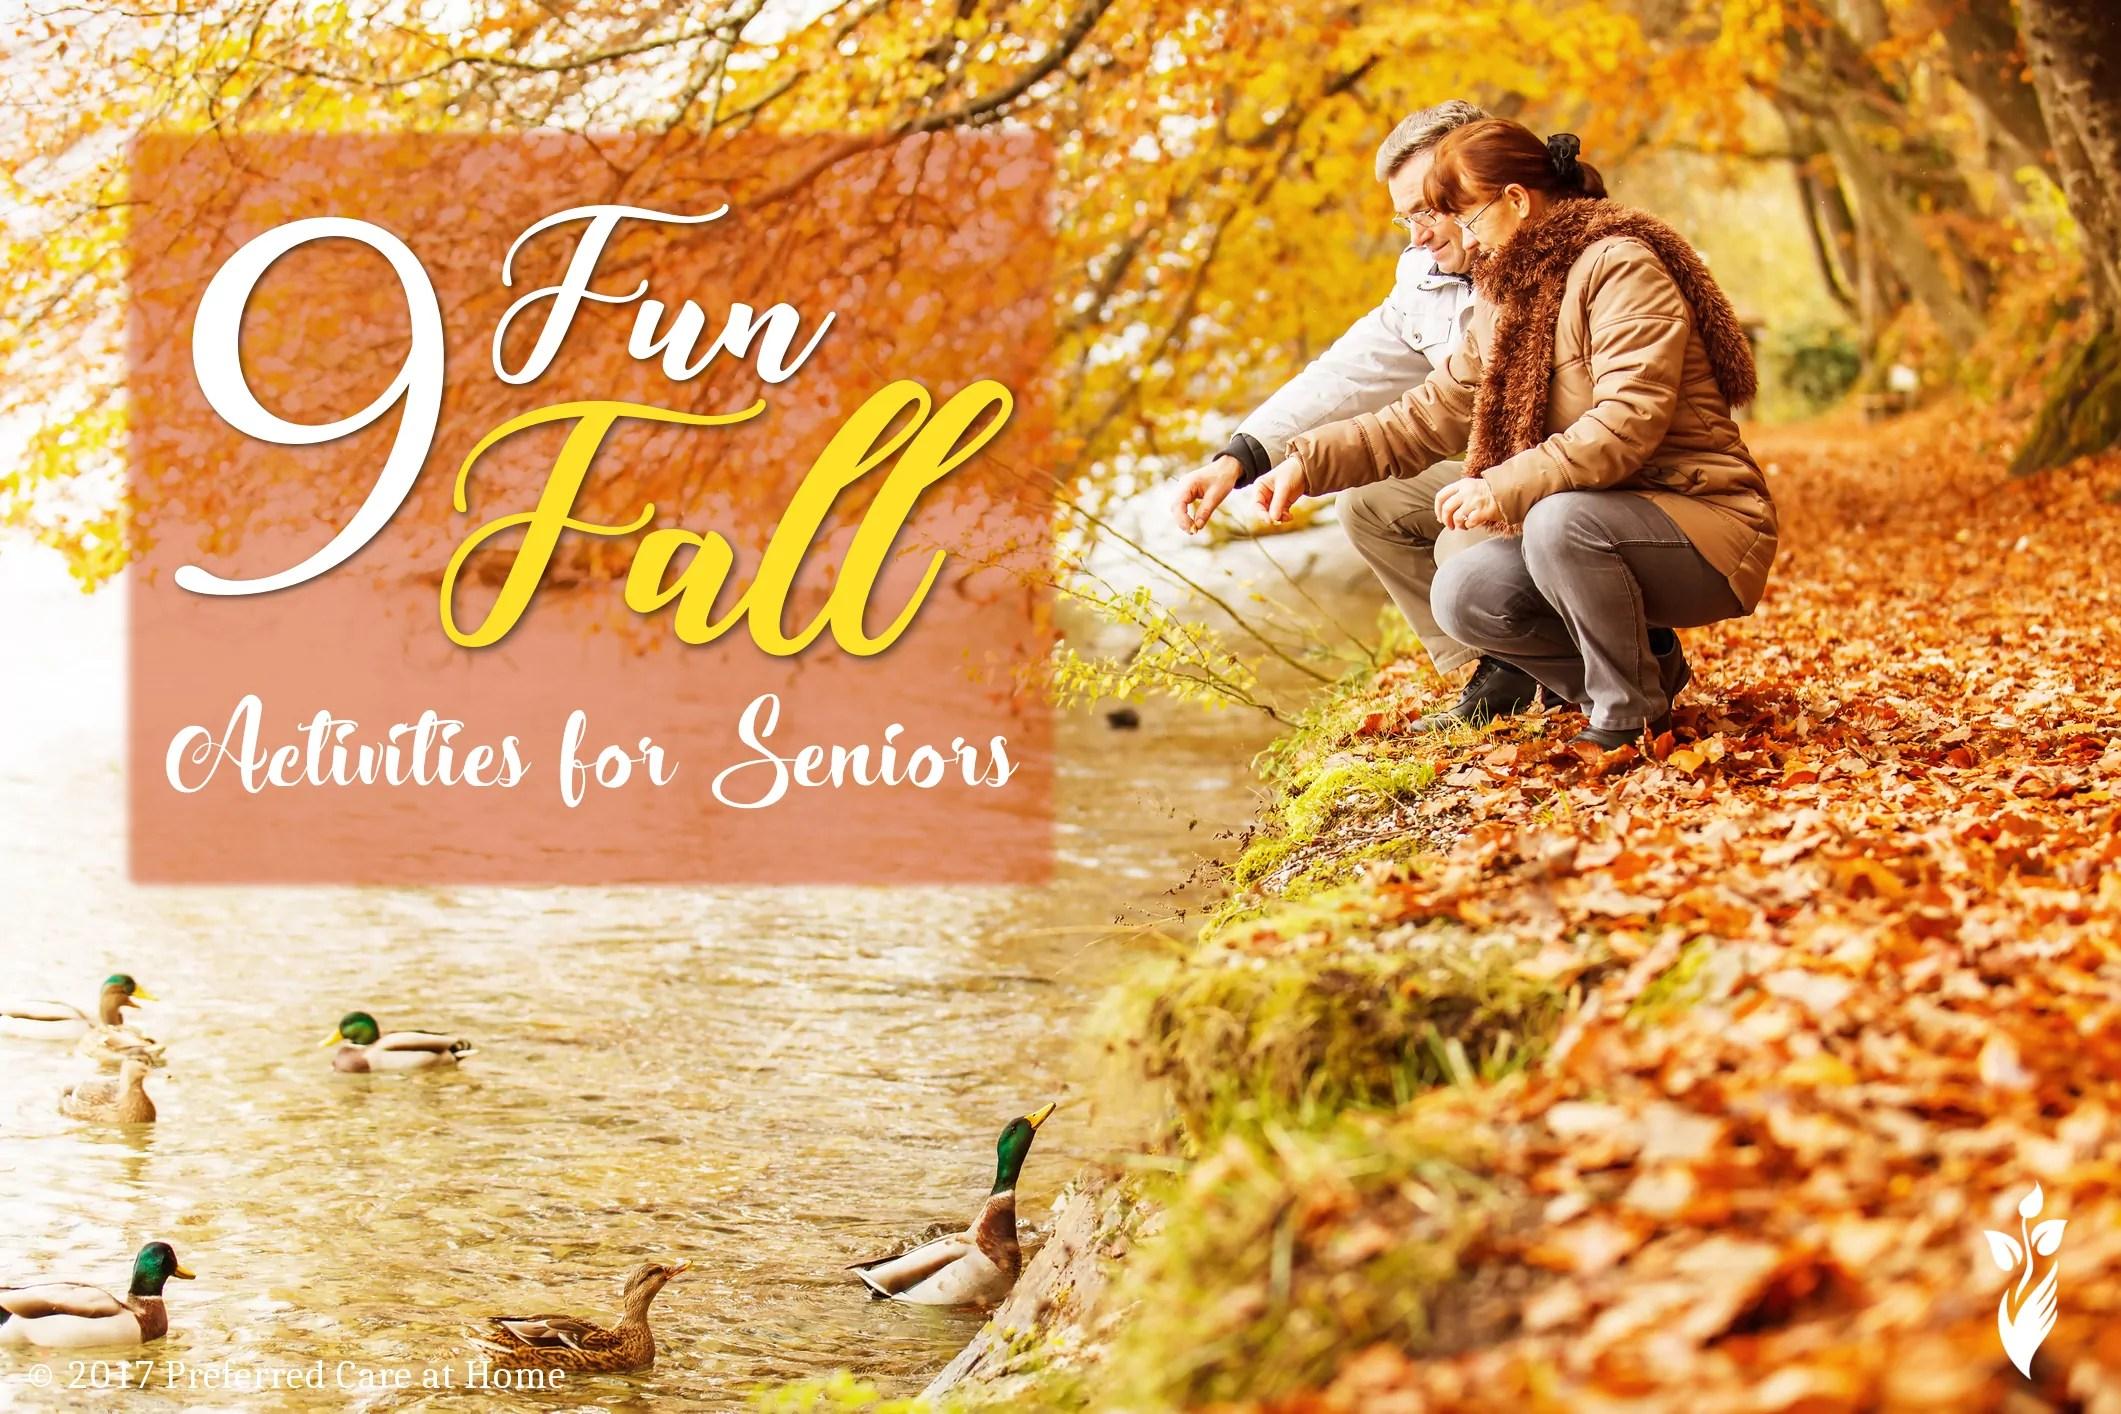 9 Senior Activities For The Fall Season